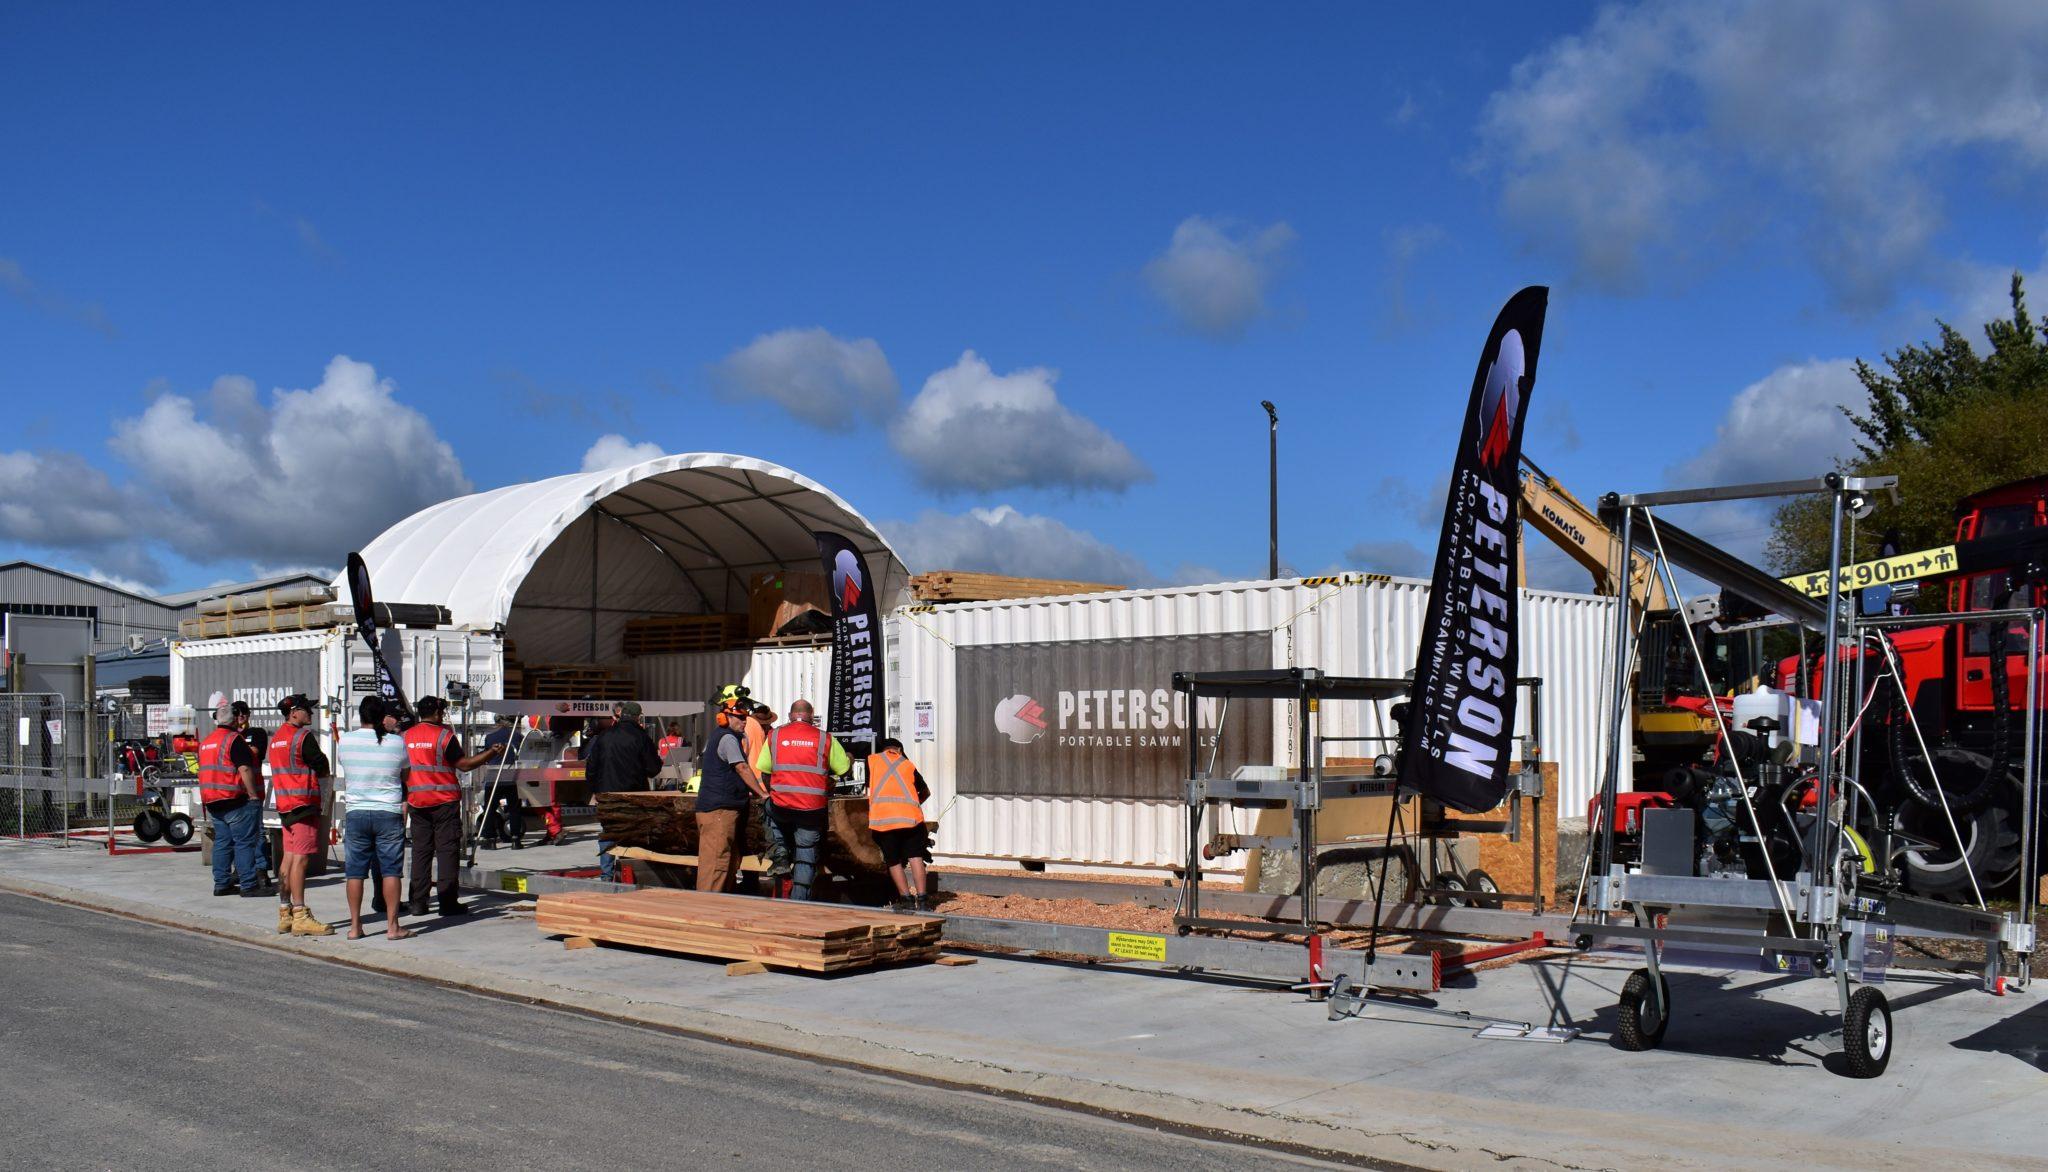 Peterson Portable Sawmills Factory, New Zealand